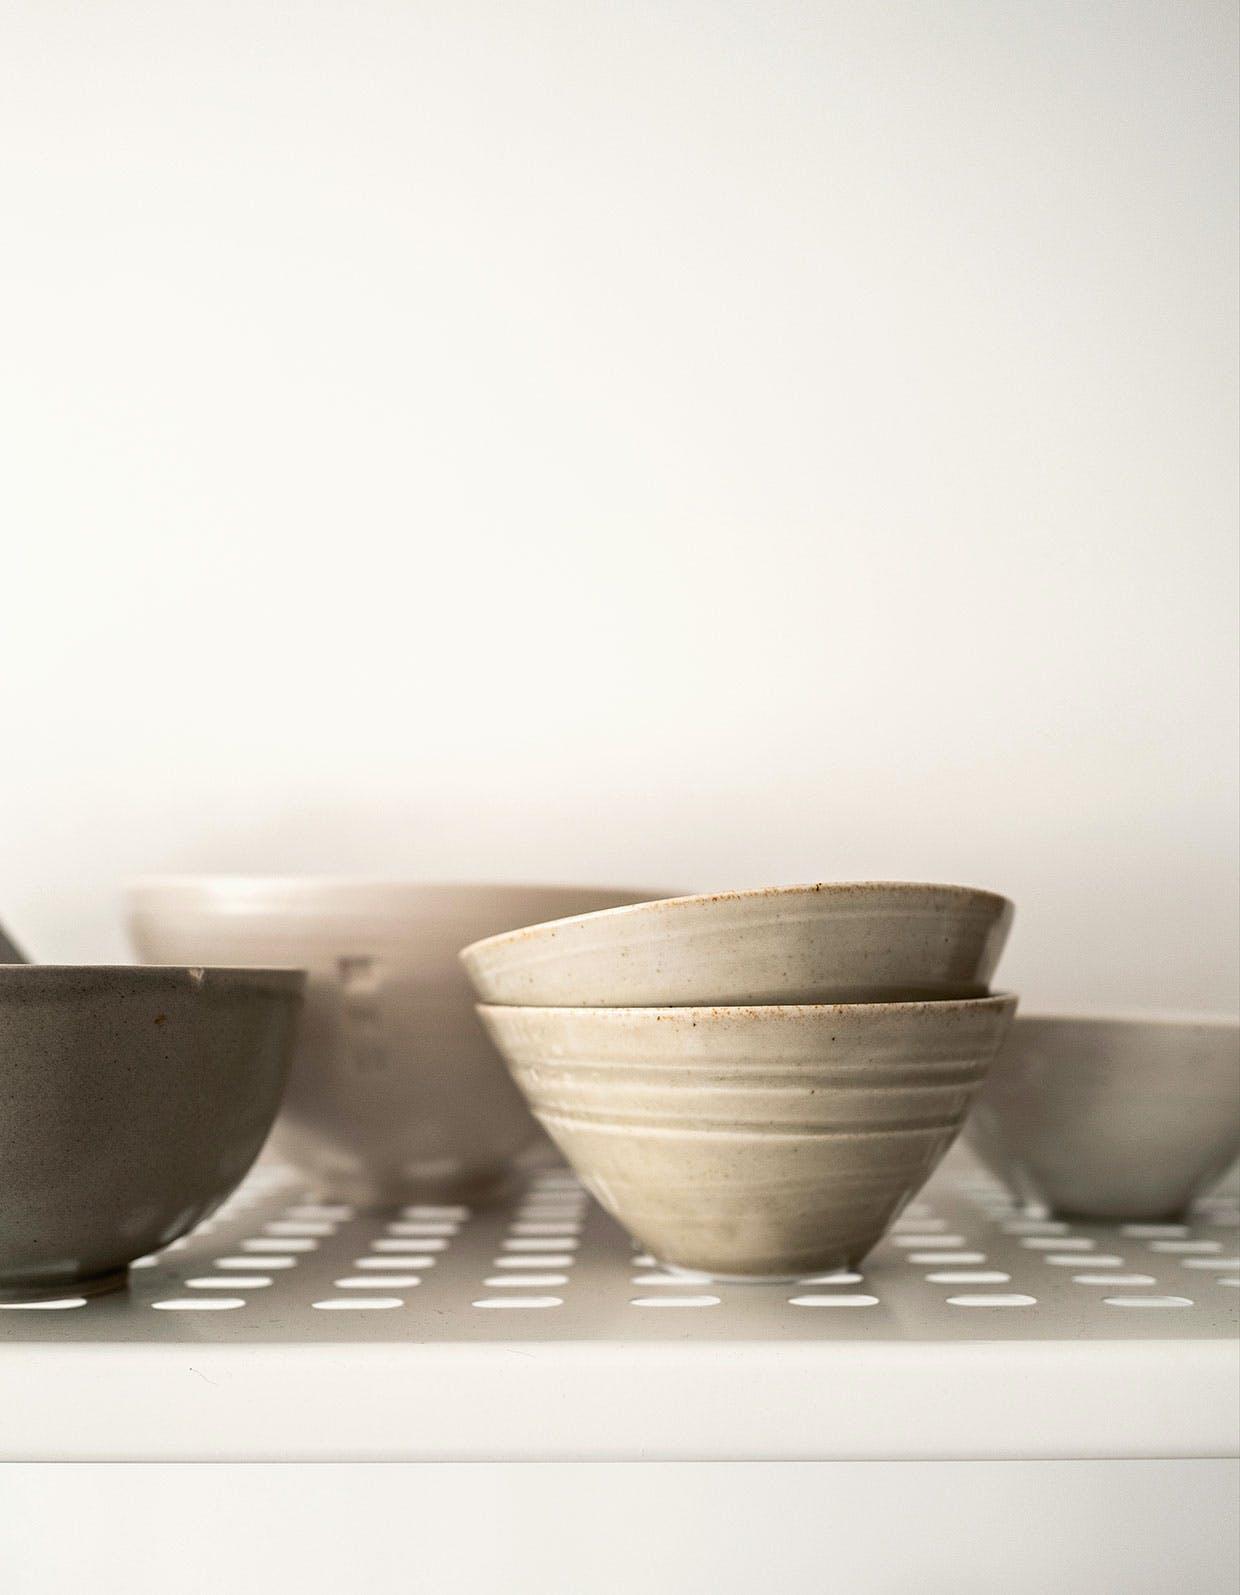 keramik køkken service